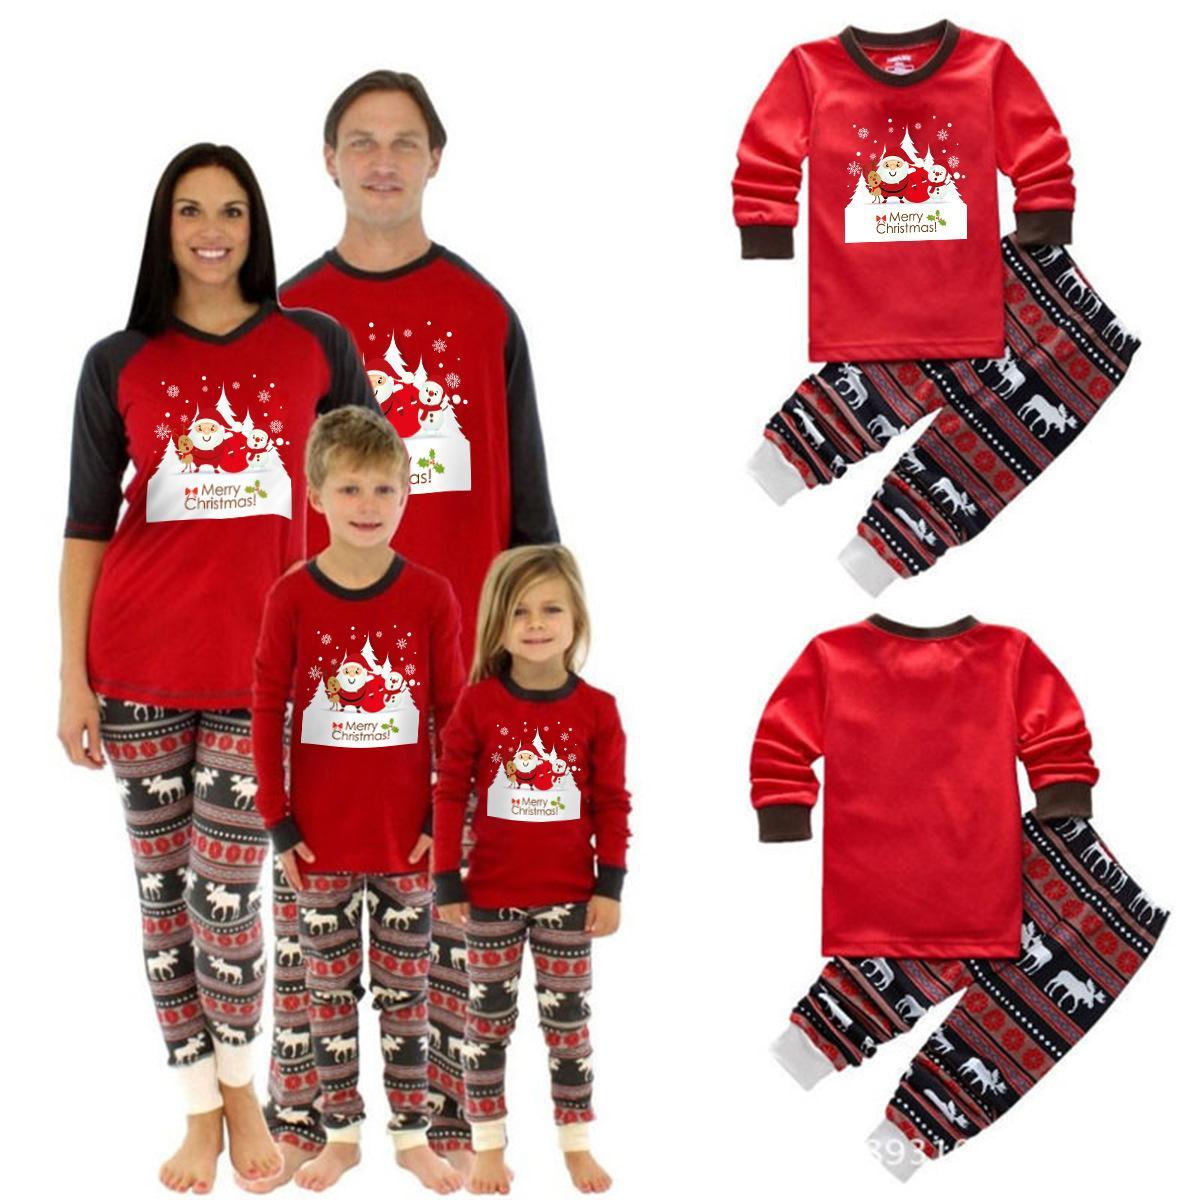 b29a17fe89 2018 Xmas Moose Sleepwear Fairy Christmas Deer Elk Family Pajamas Set Adult  Kids Striped Parent Child Nightwear Party Clothing Homewear Best Odd Family  ...